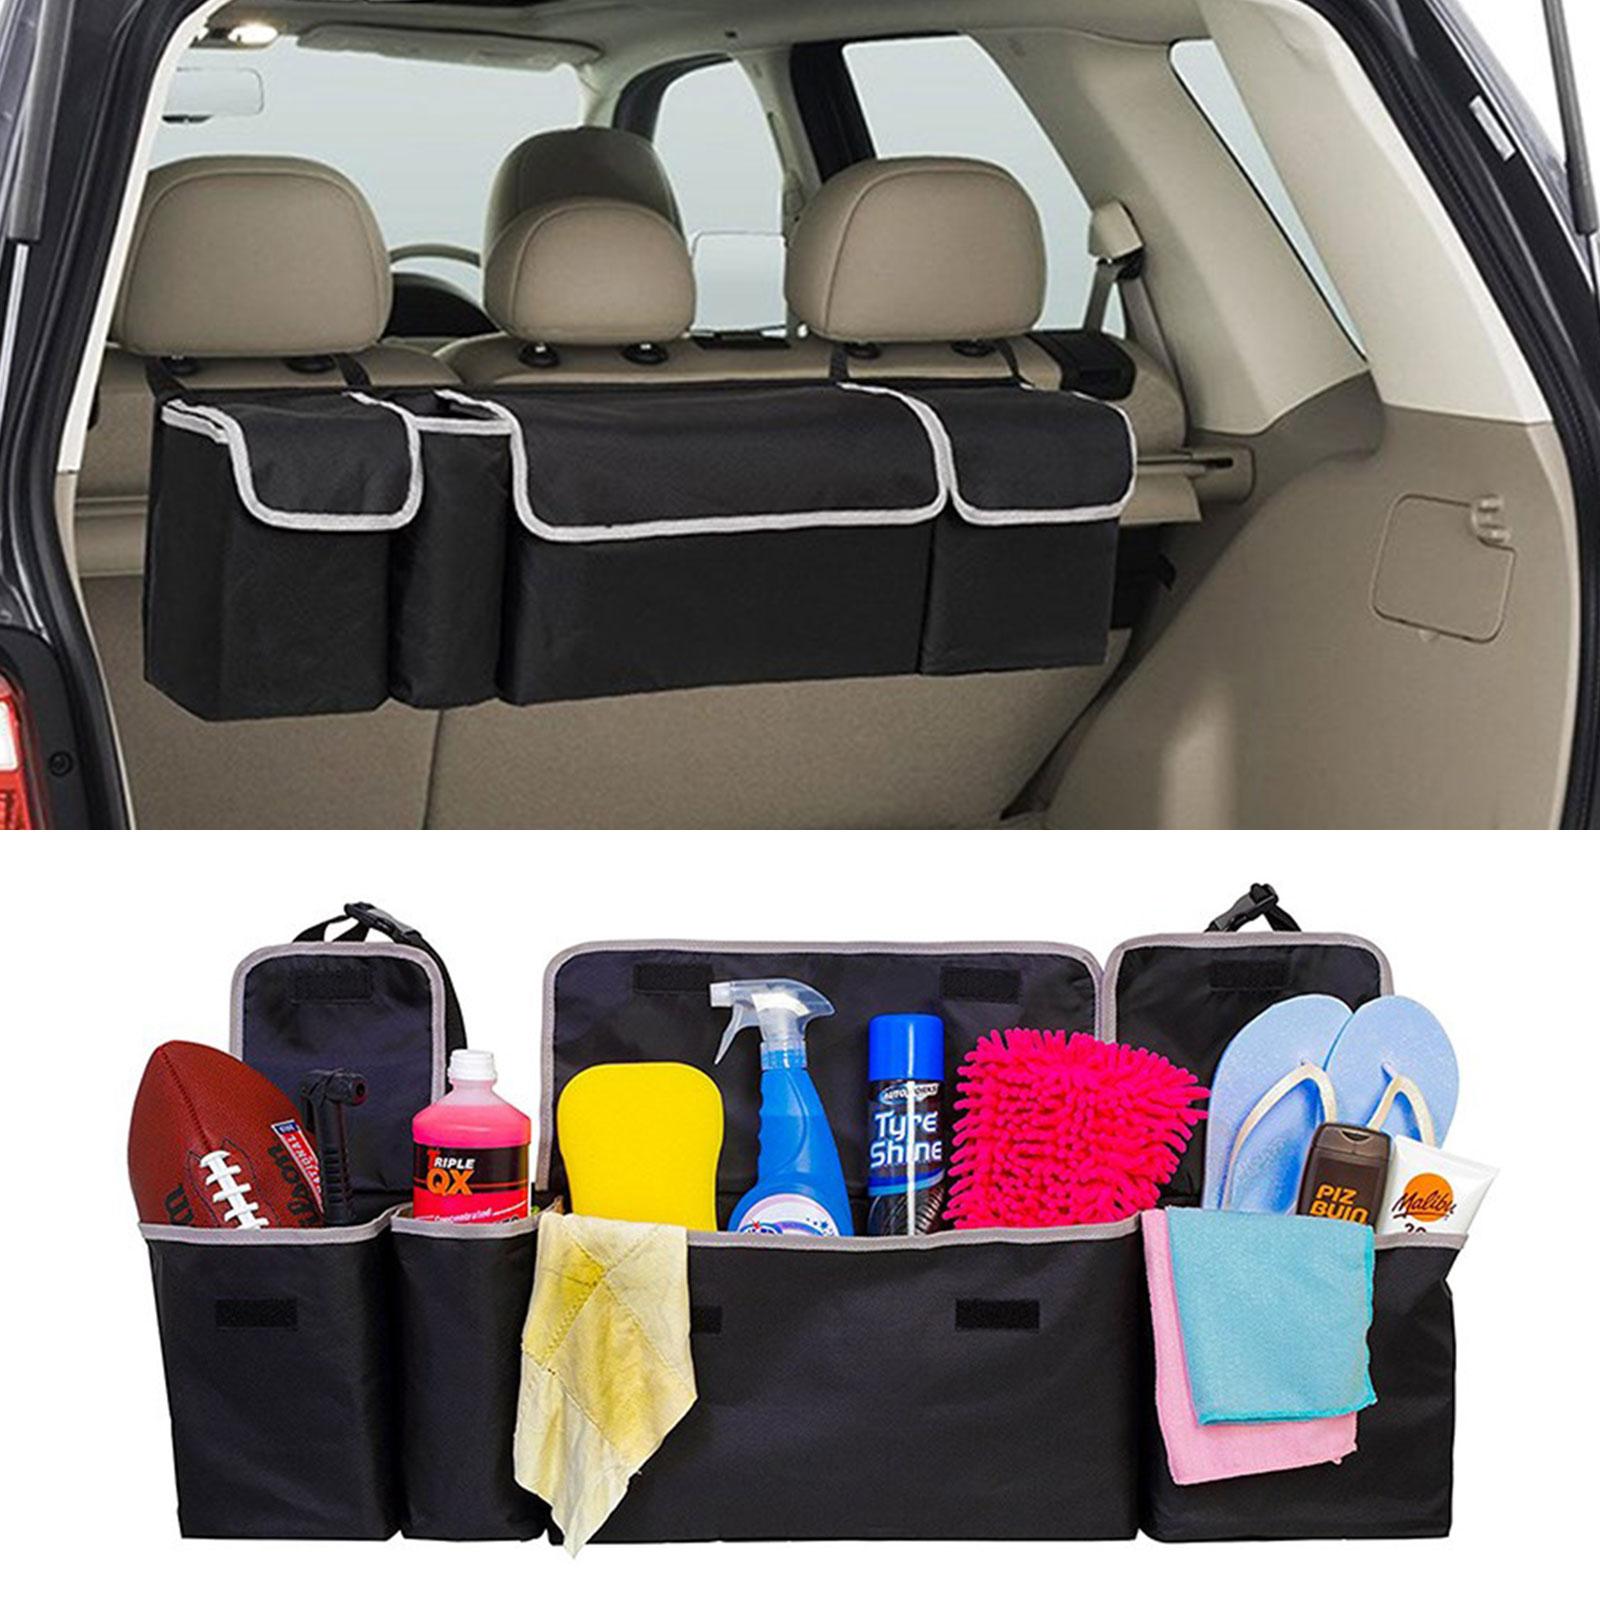 TSV 36x10x4.8 inch Black High Capacity Multi-use Car Seat Back Organizers Bag Interior Accessories For SUV, car, truck, jeep, mini van, vehicles